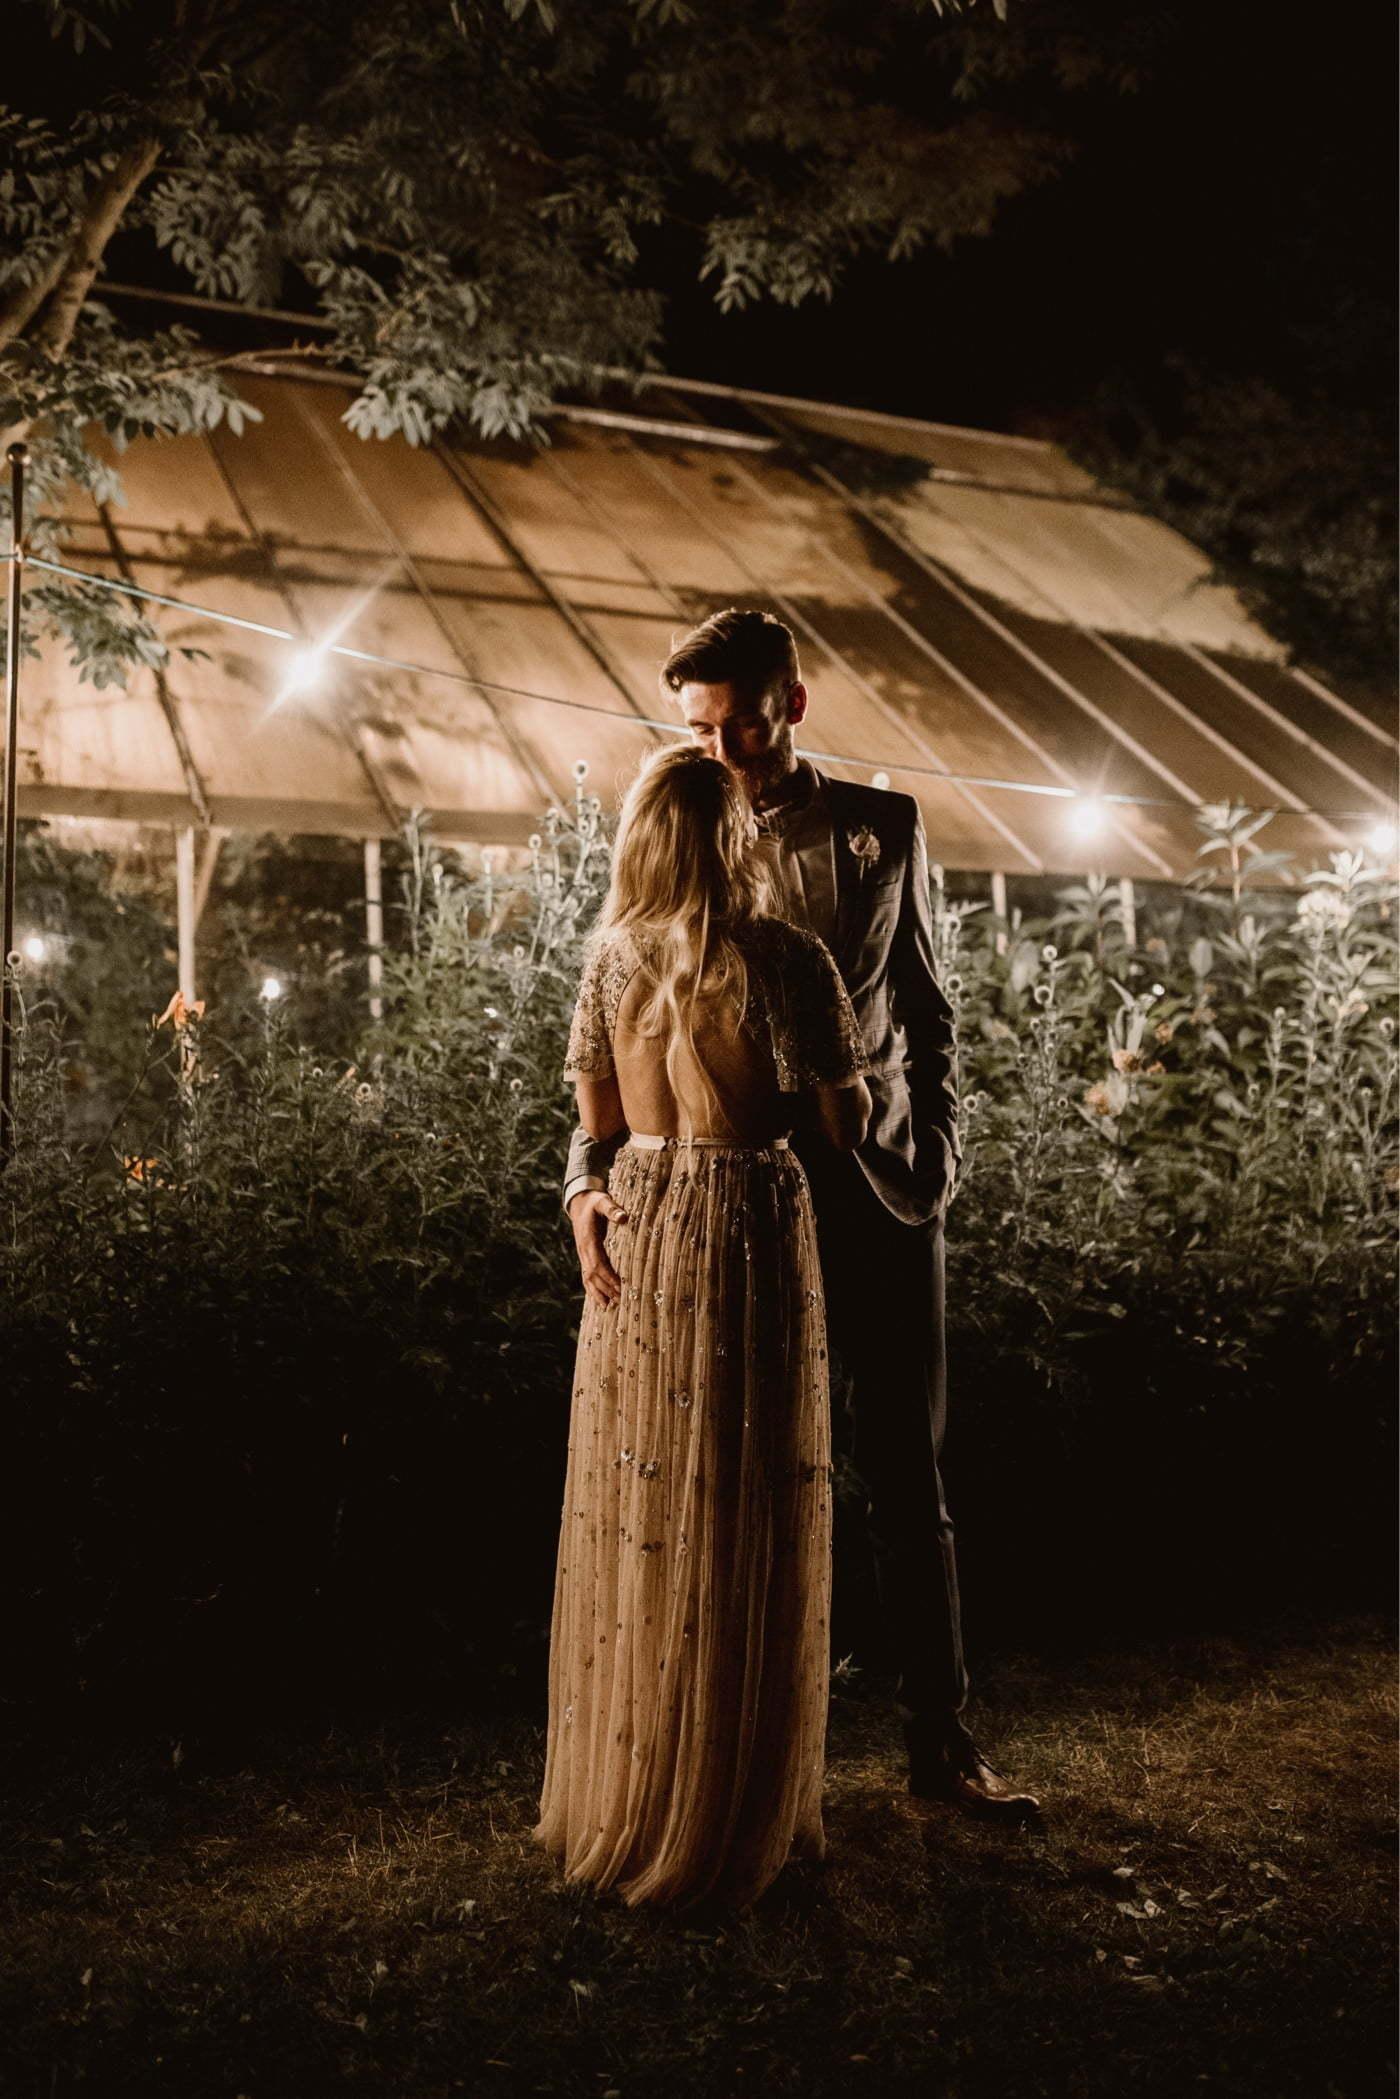 ewelina zieba rustykalne wesele stara oranzeria warszawa 088